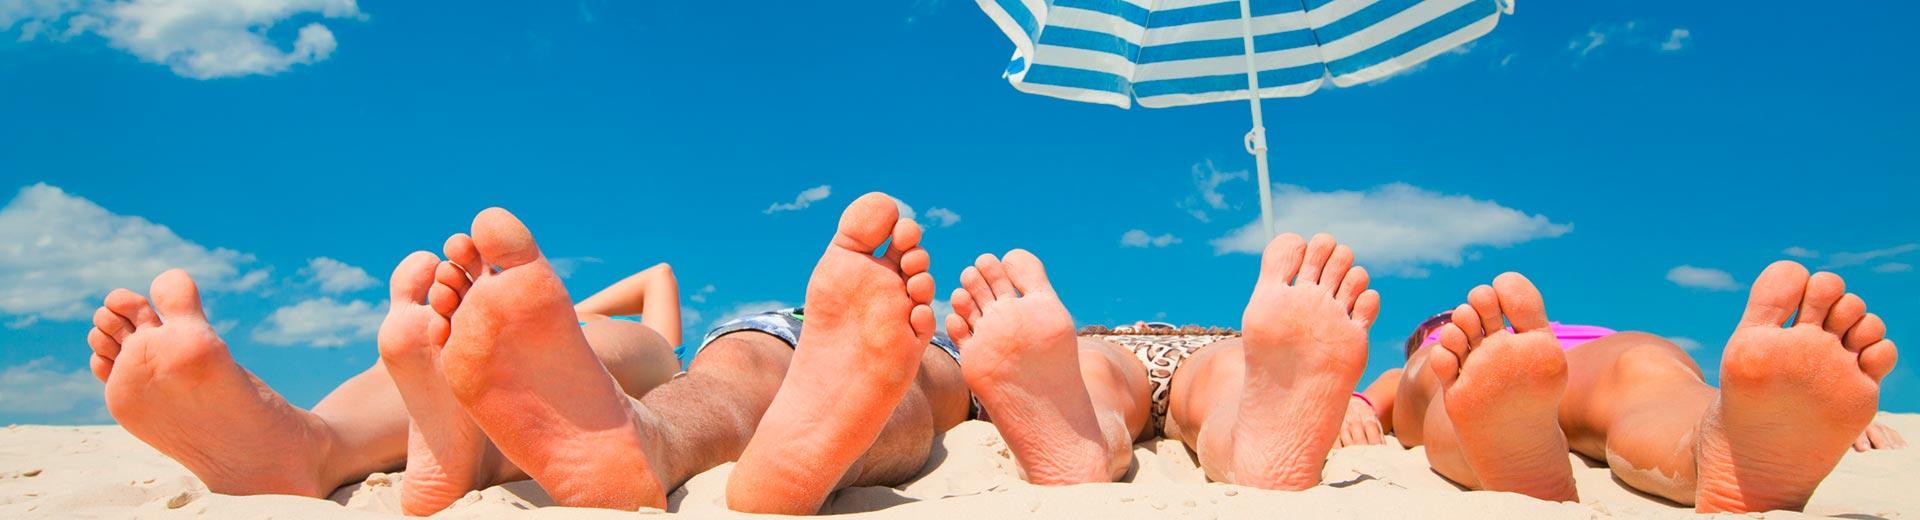 Ferien am Meer